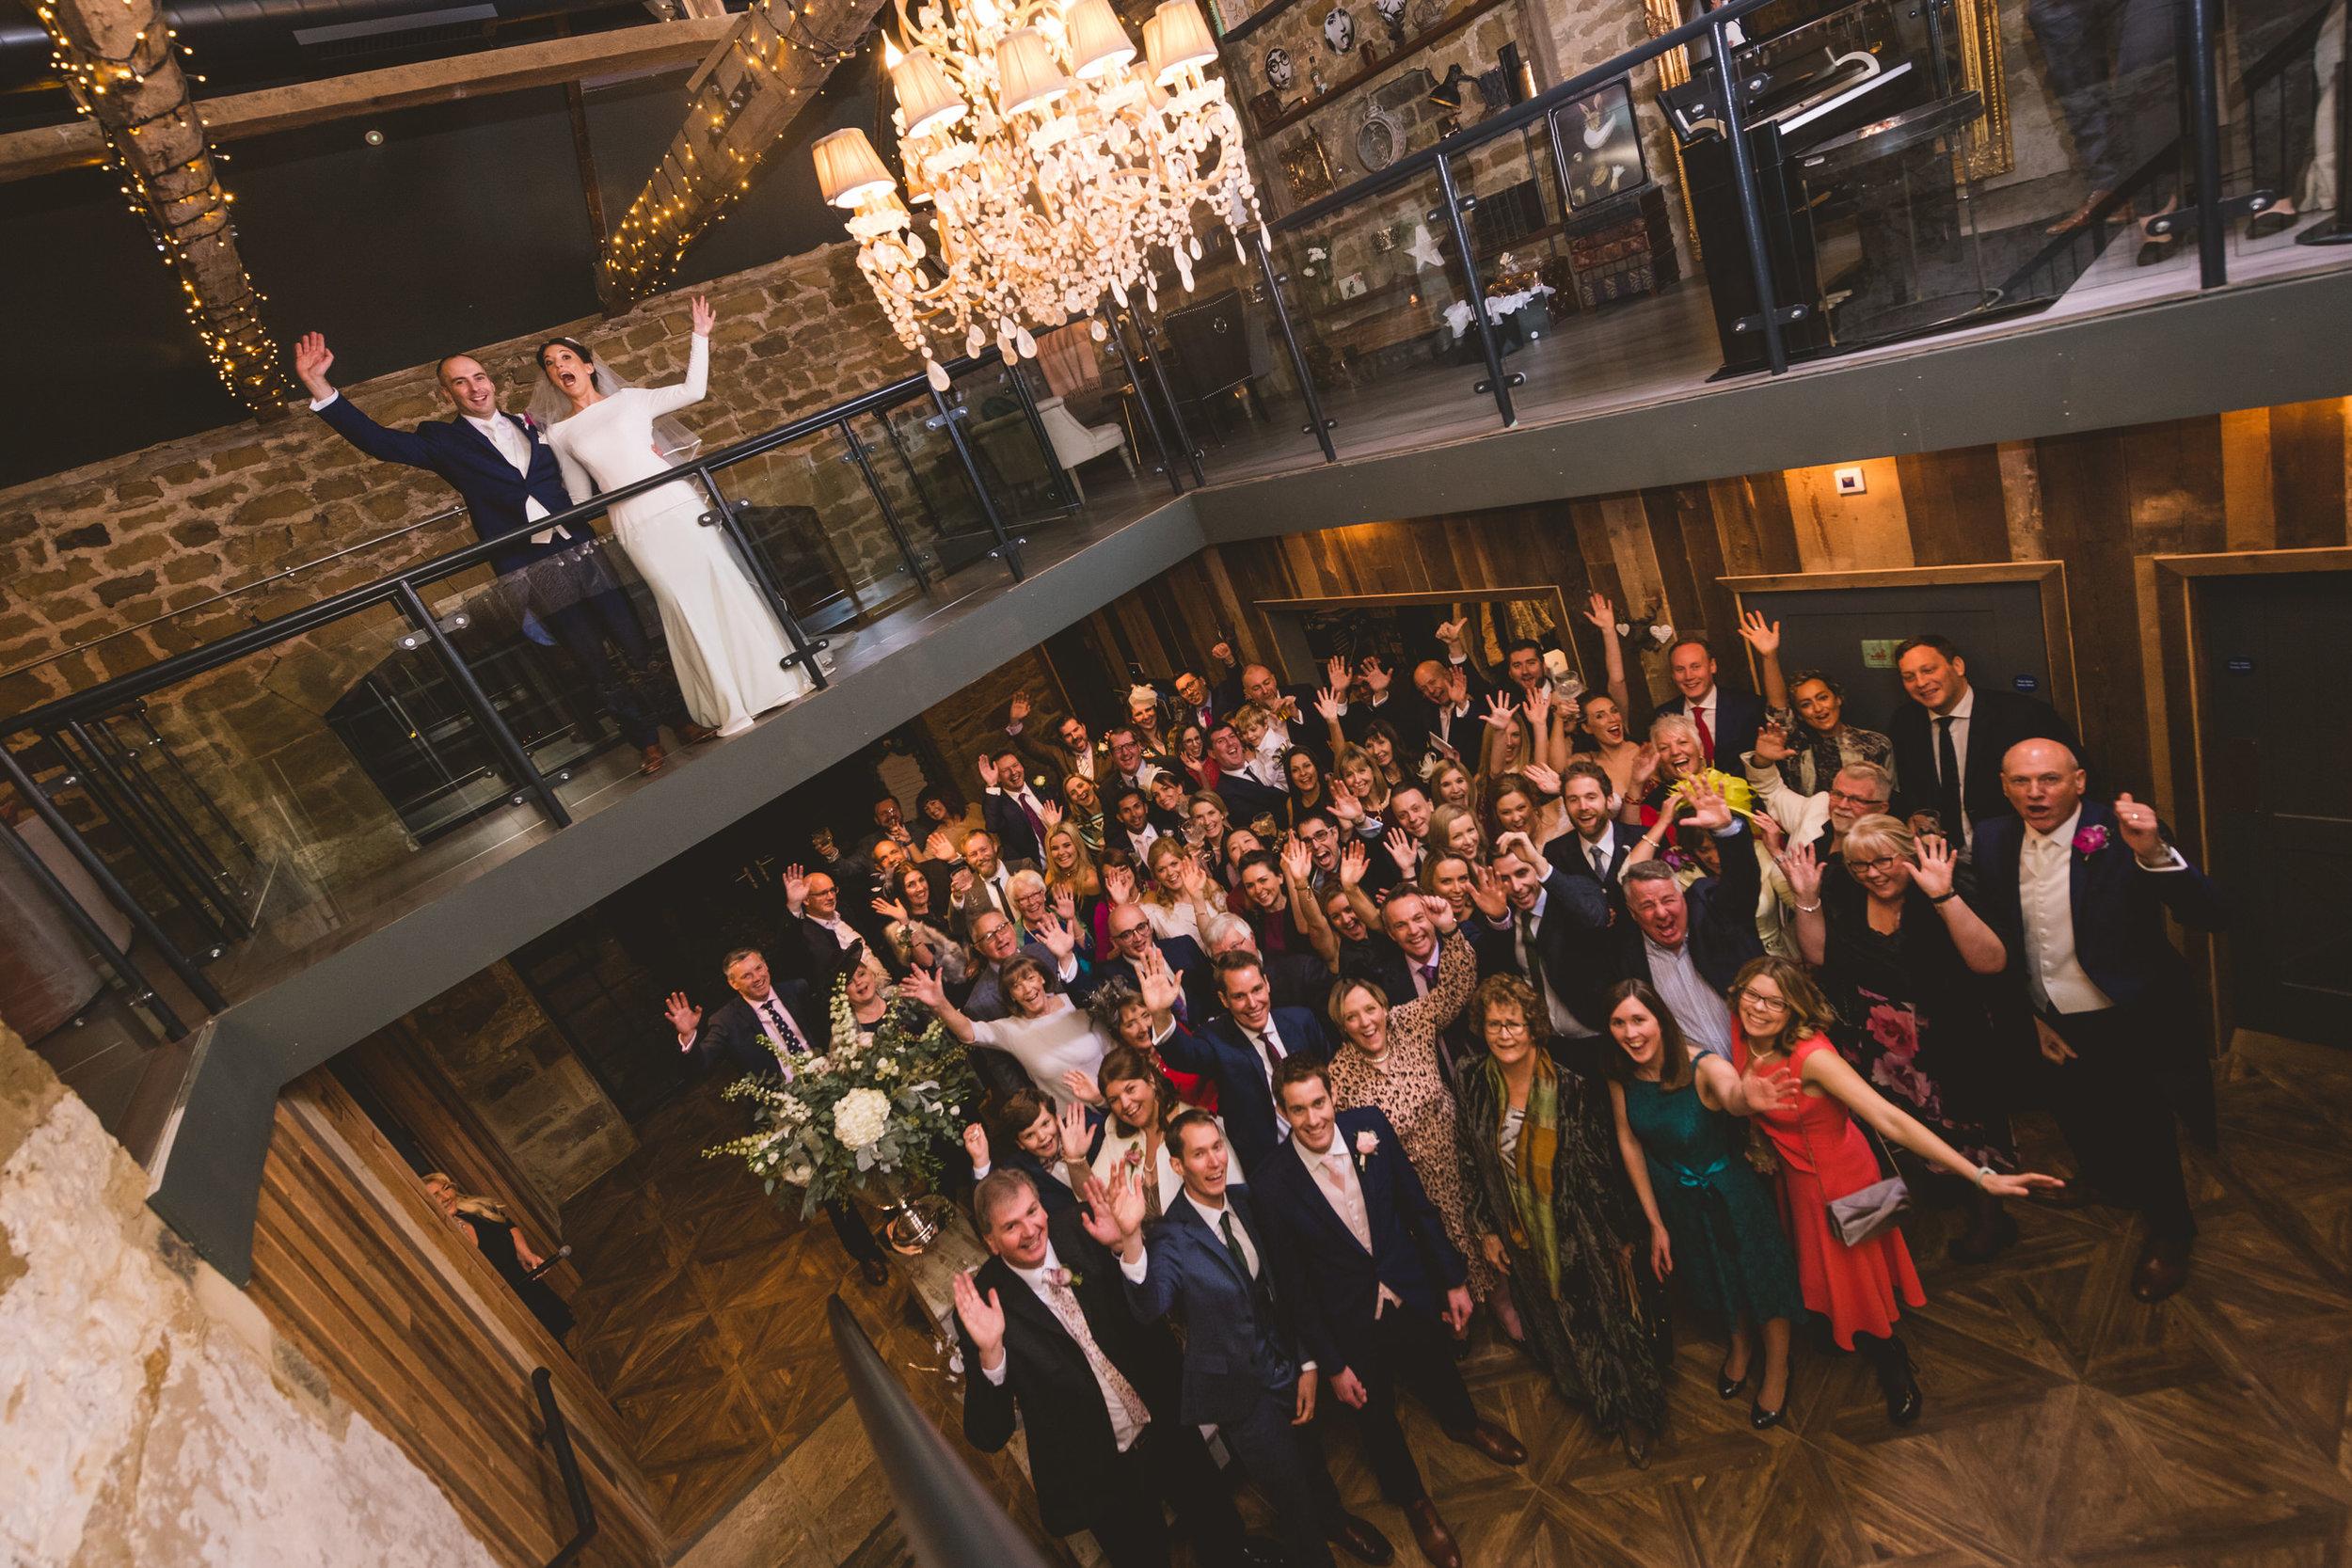 wharfedale-grange-harrogate-wedding-photographer-56.jpg